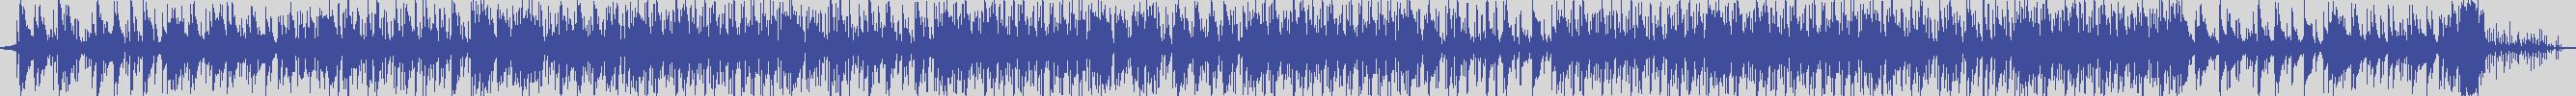 worldwide_music_records [WMR004] Difetti Sonori - To Climb a Cliff [Original Mix] audio wave form